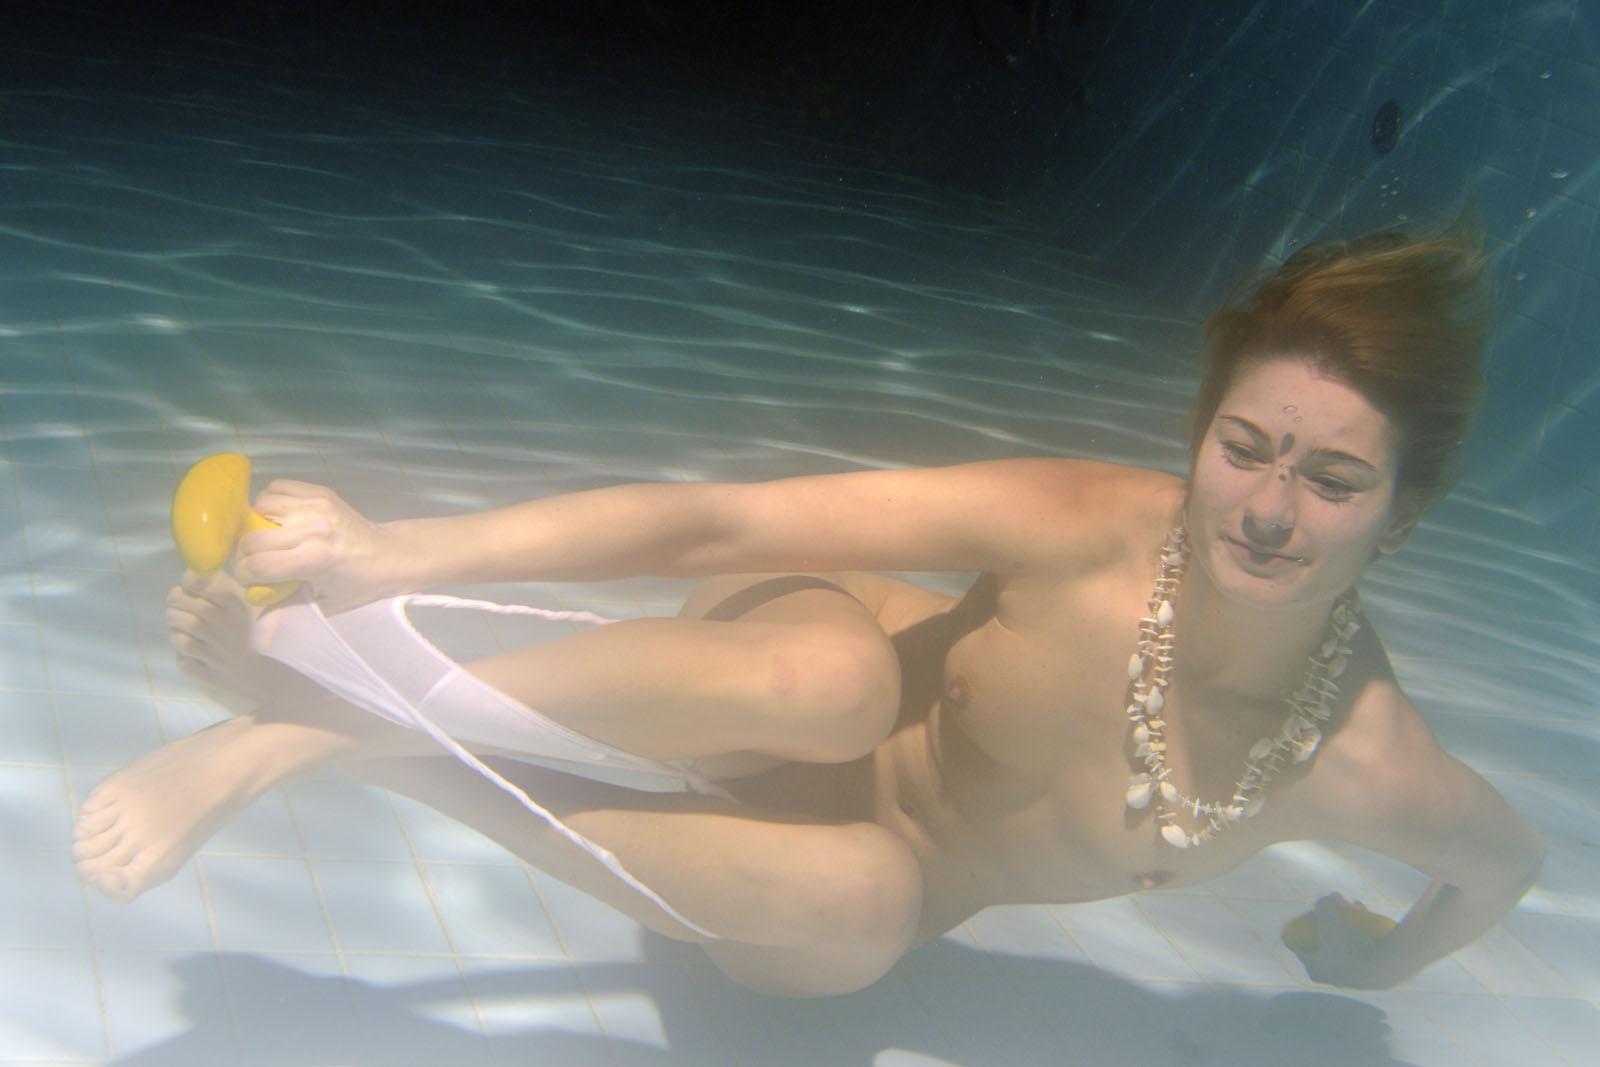 Girls swimming nude